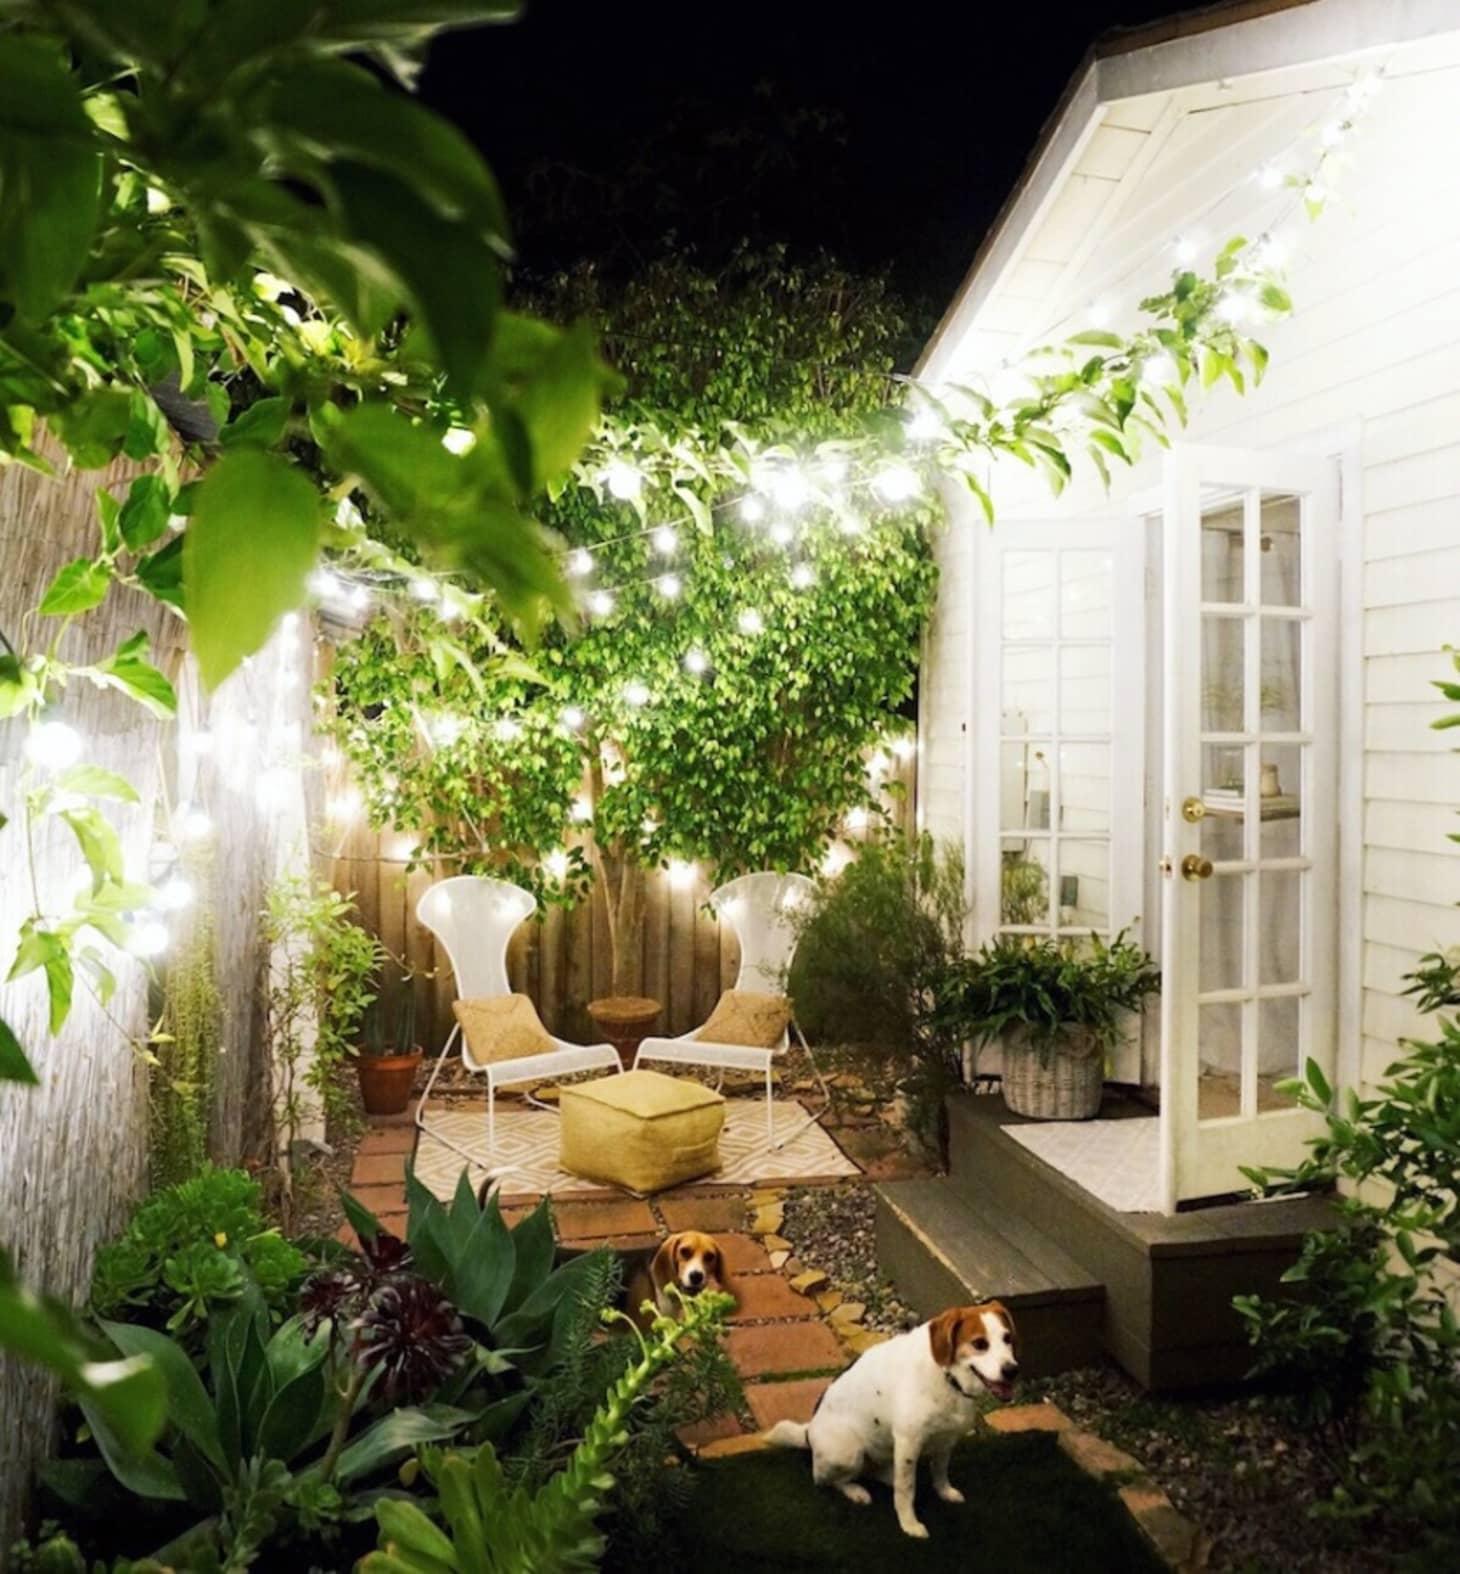 Small Backyard Design Ideas & Inspiration | Apartment Therapy on Apartment Backyard Patio Ideas id=60762